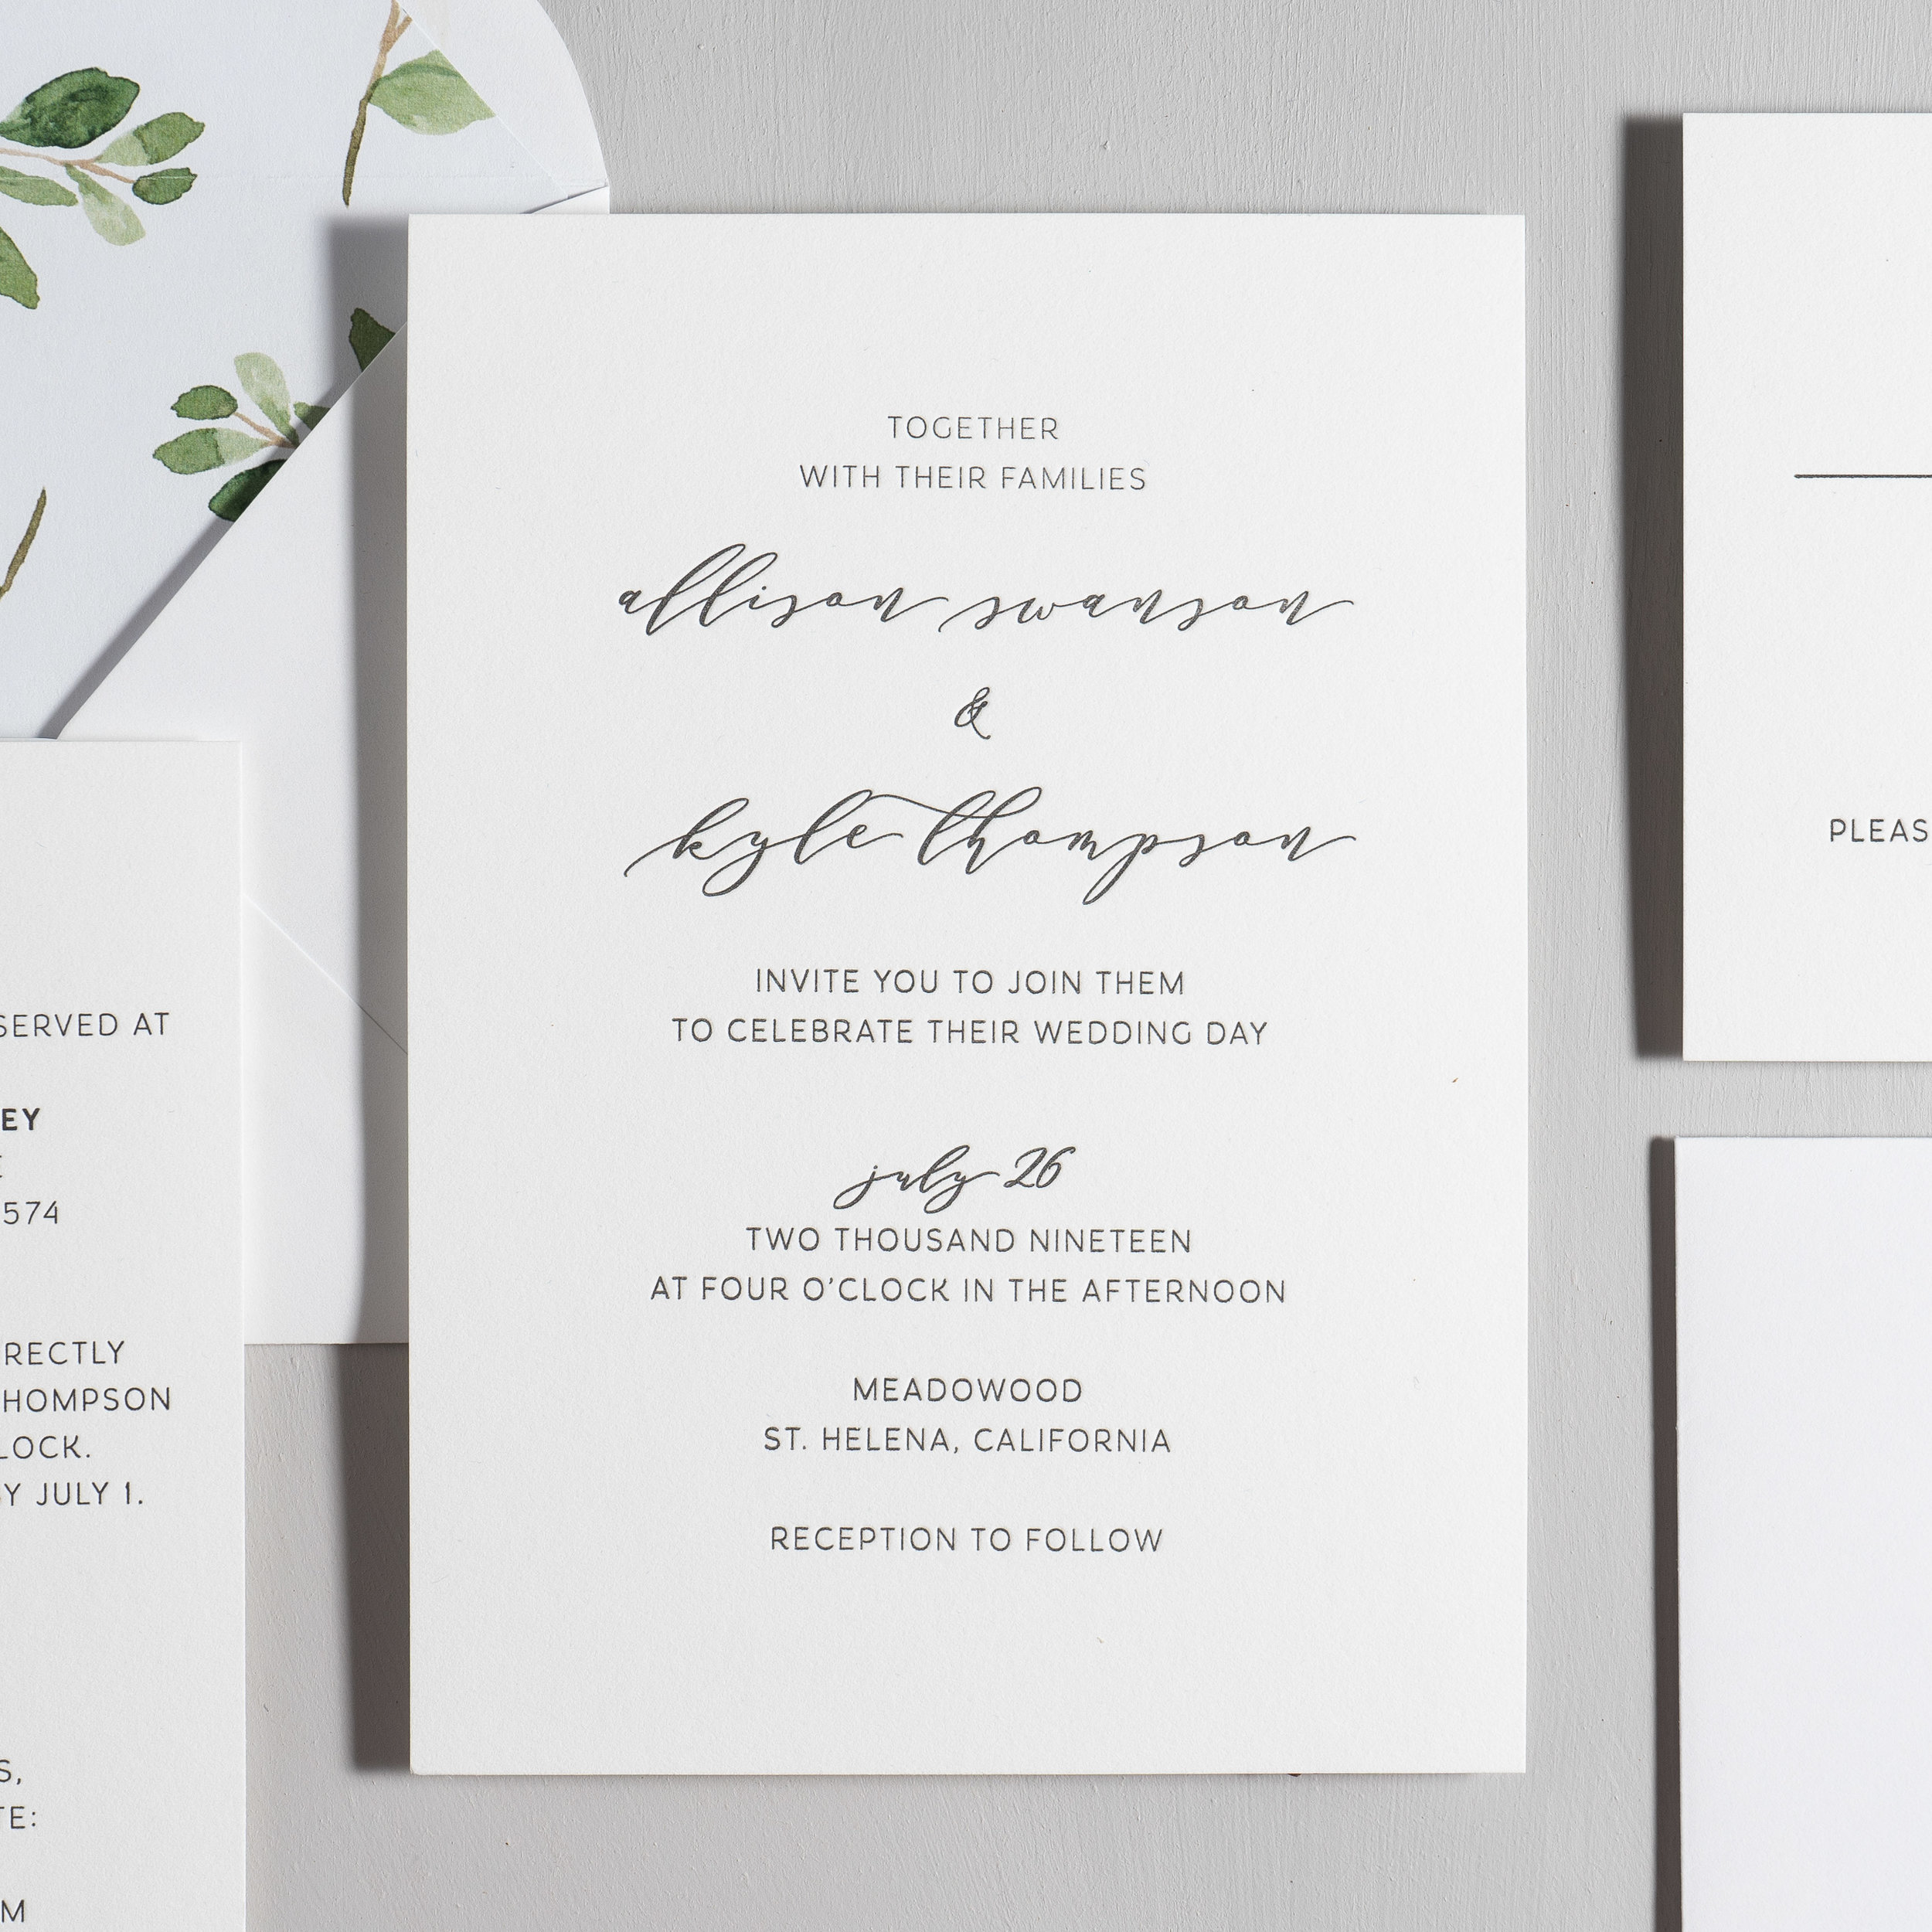 Modern Greenery V2 Letterpress Wedding Invitation